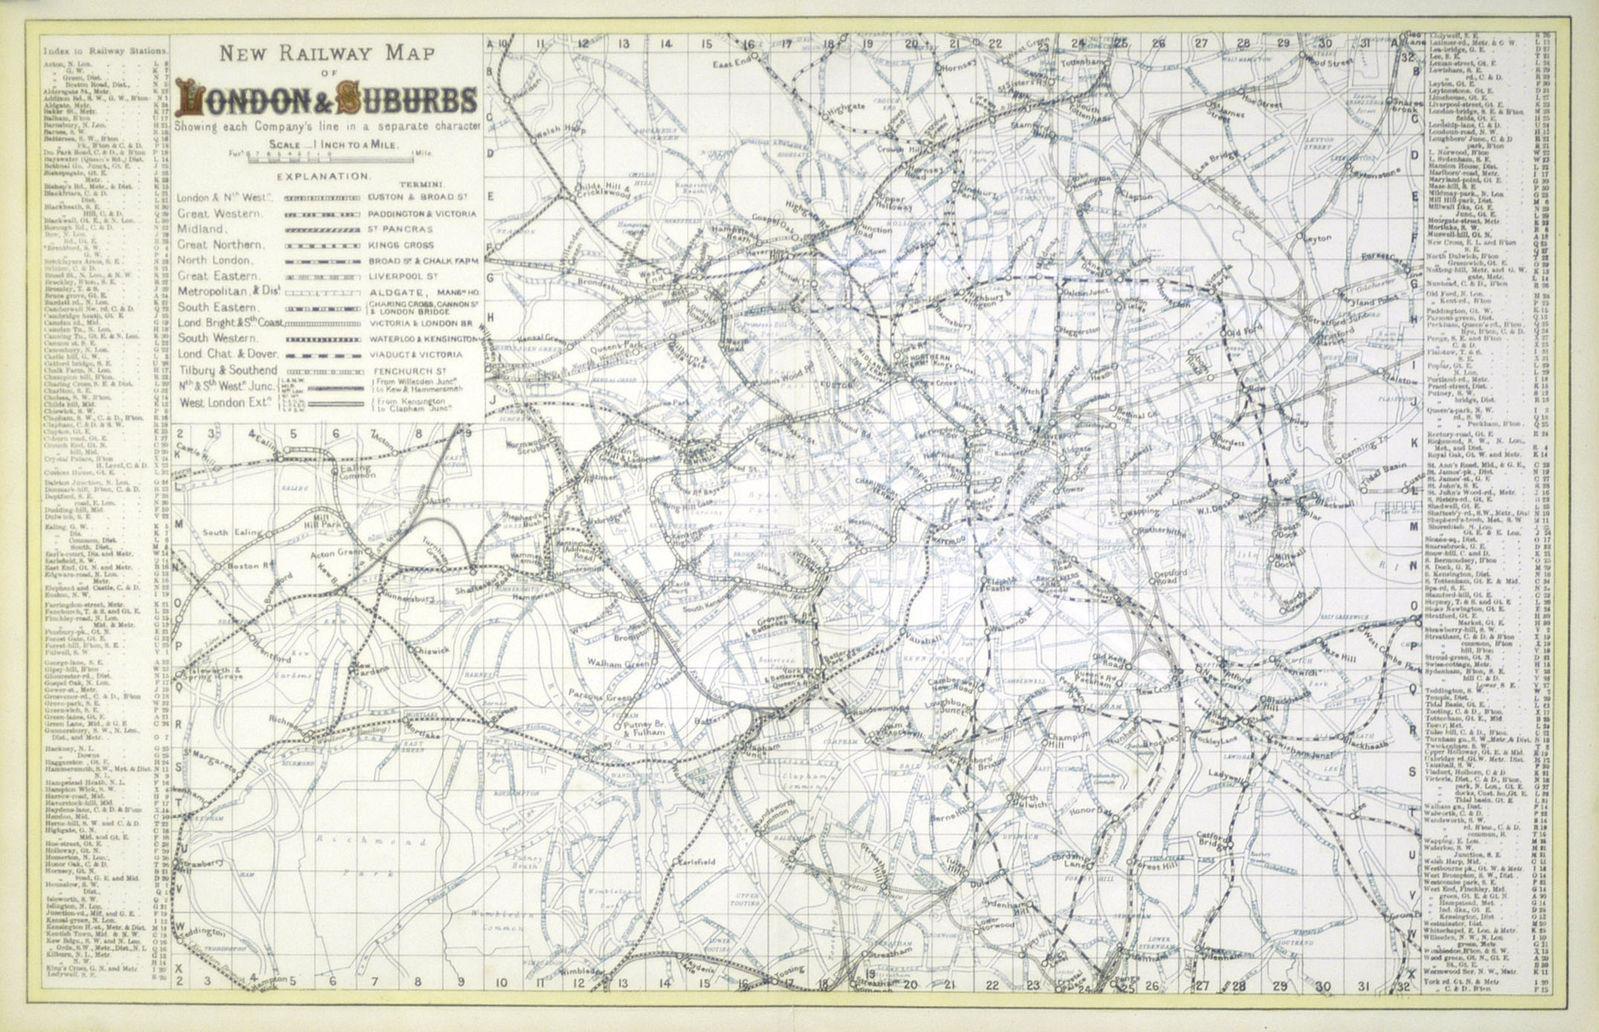 Map Of London And Surrounding Suburbs.Jonathan Potter Map New Railway Map Of London Suburbs